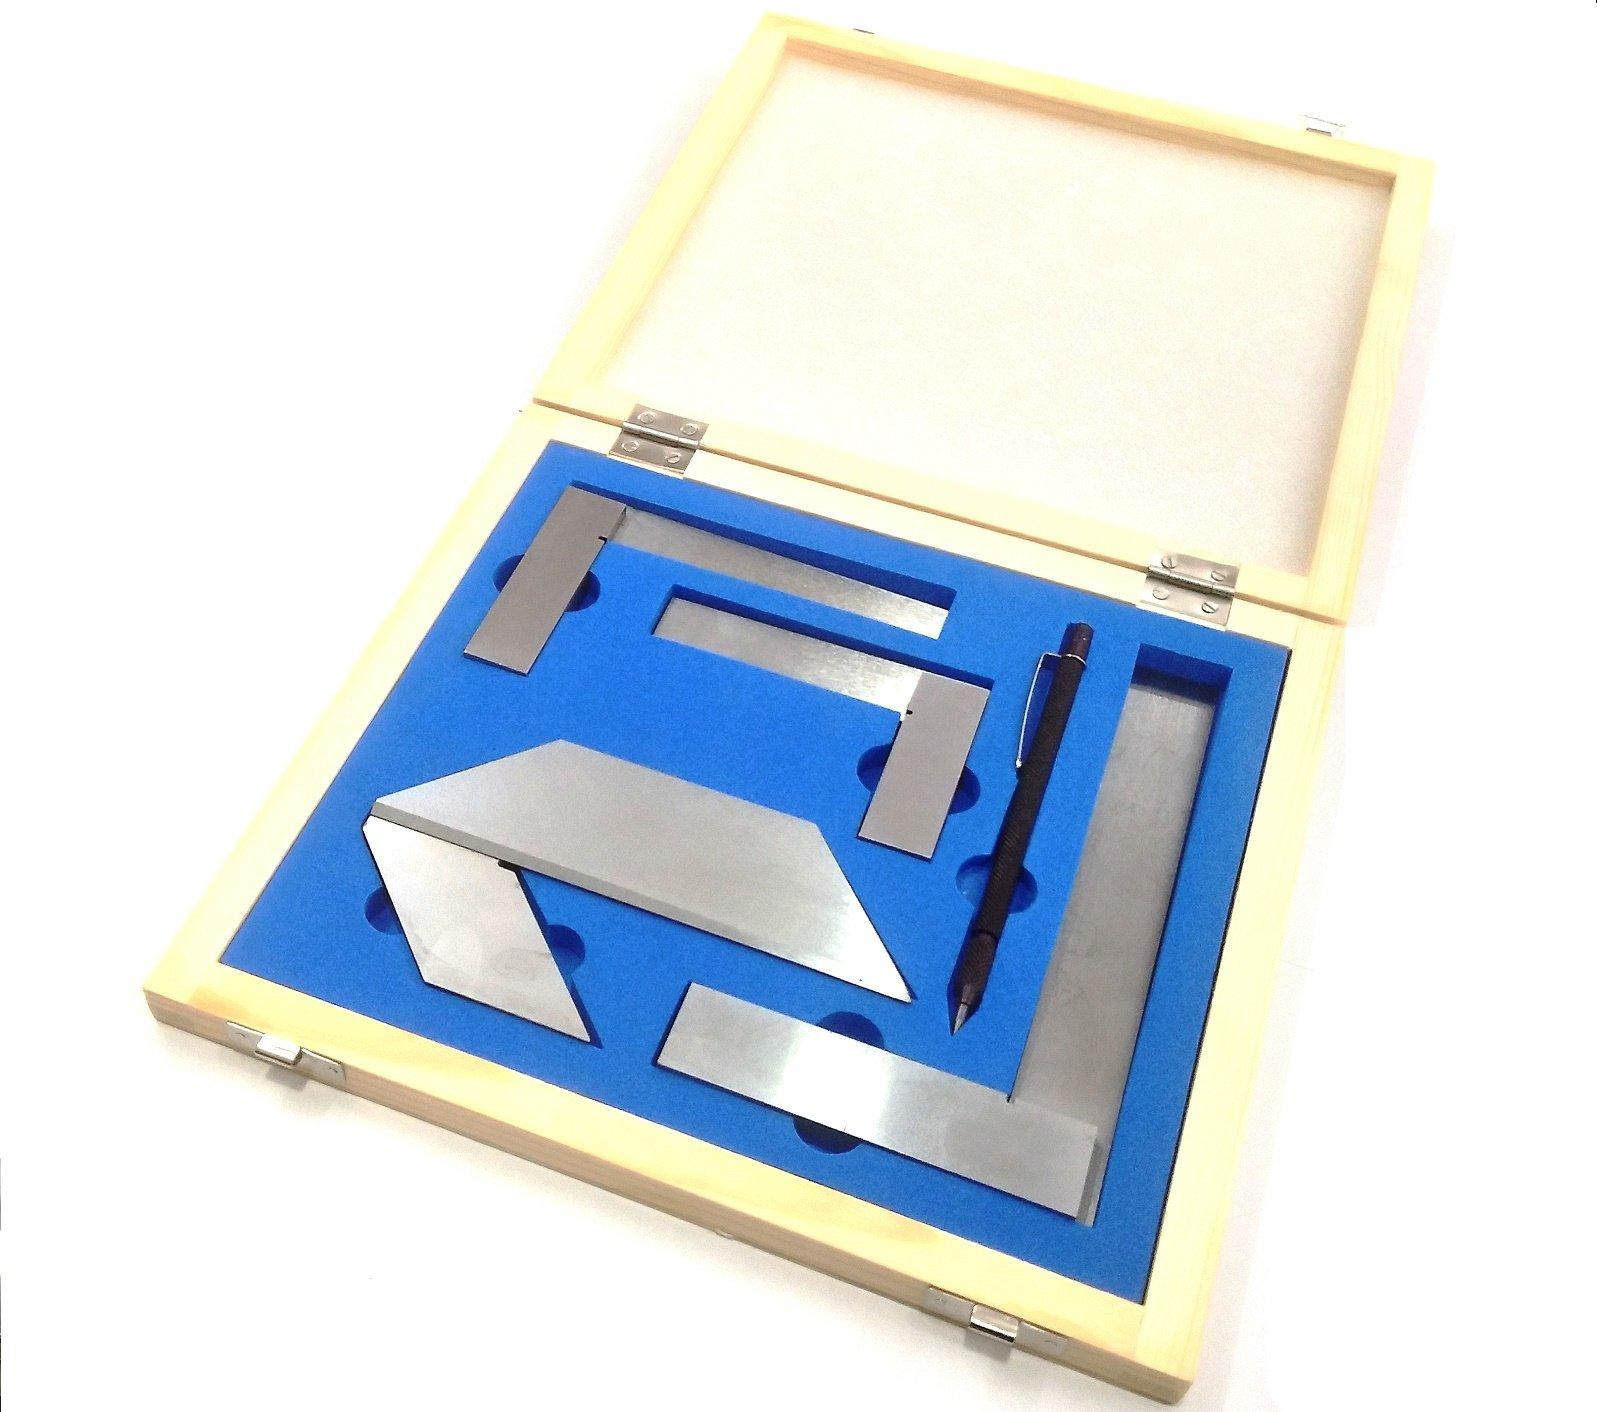 Starter Engineer Kit (Try Squares, Center Squares & Carbide Scriber Pen)//Wooden Packaging